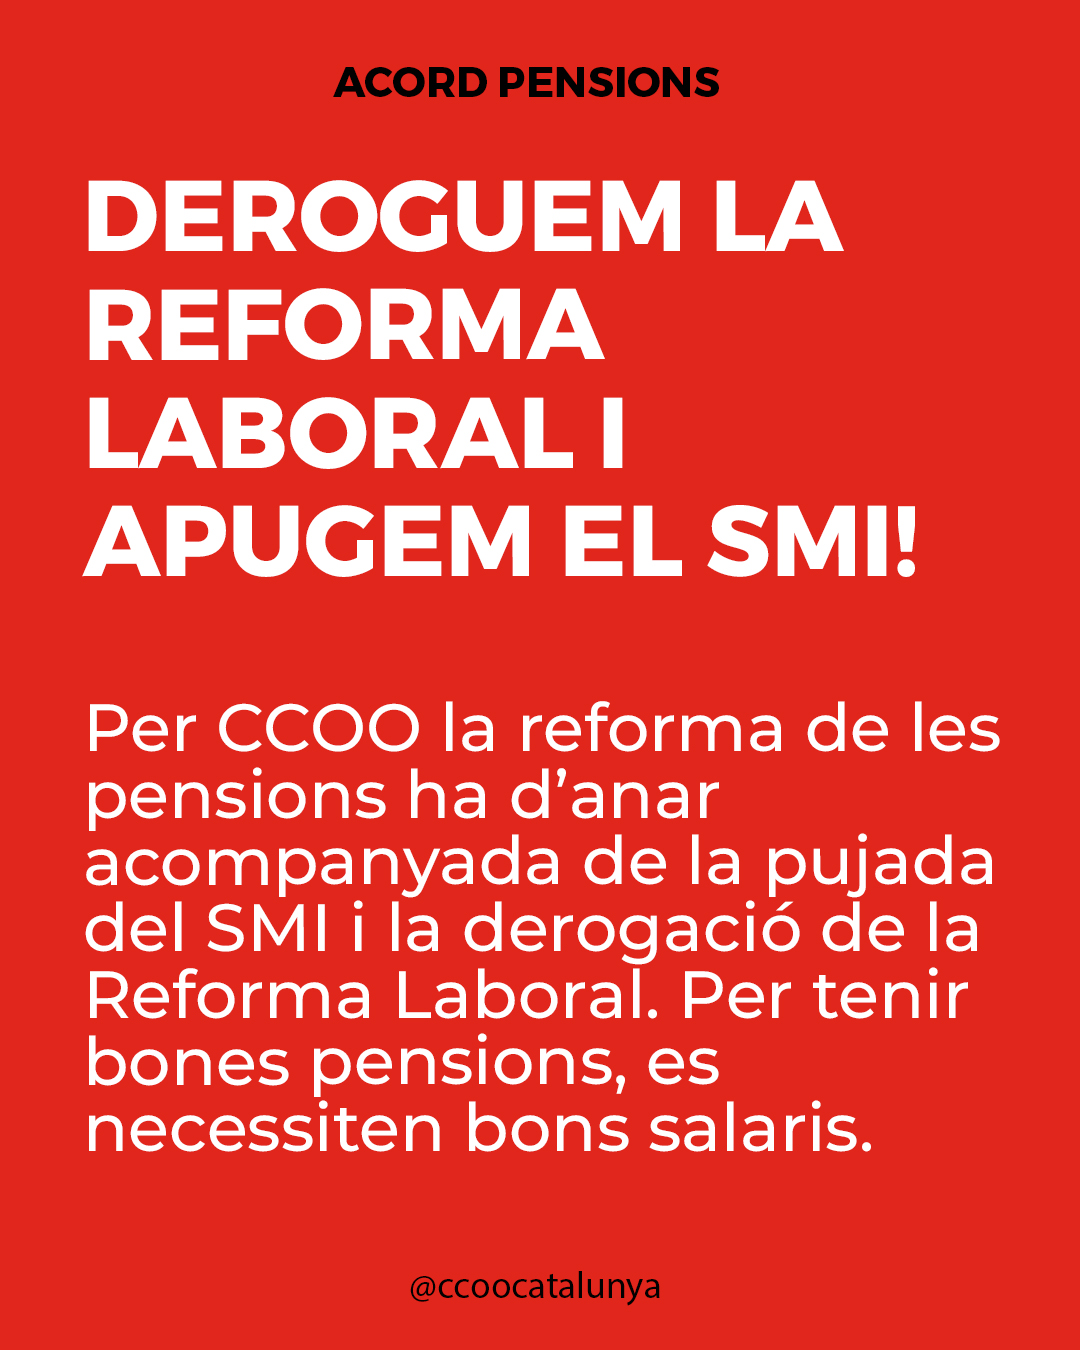 Deroguem la reforma laboral i apugem el SMI!